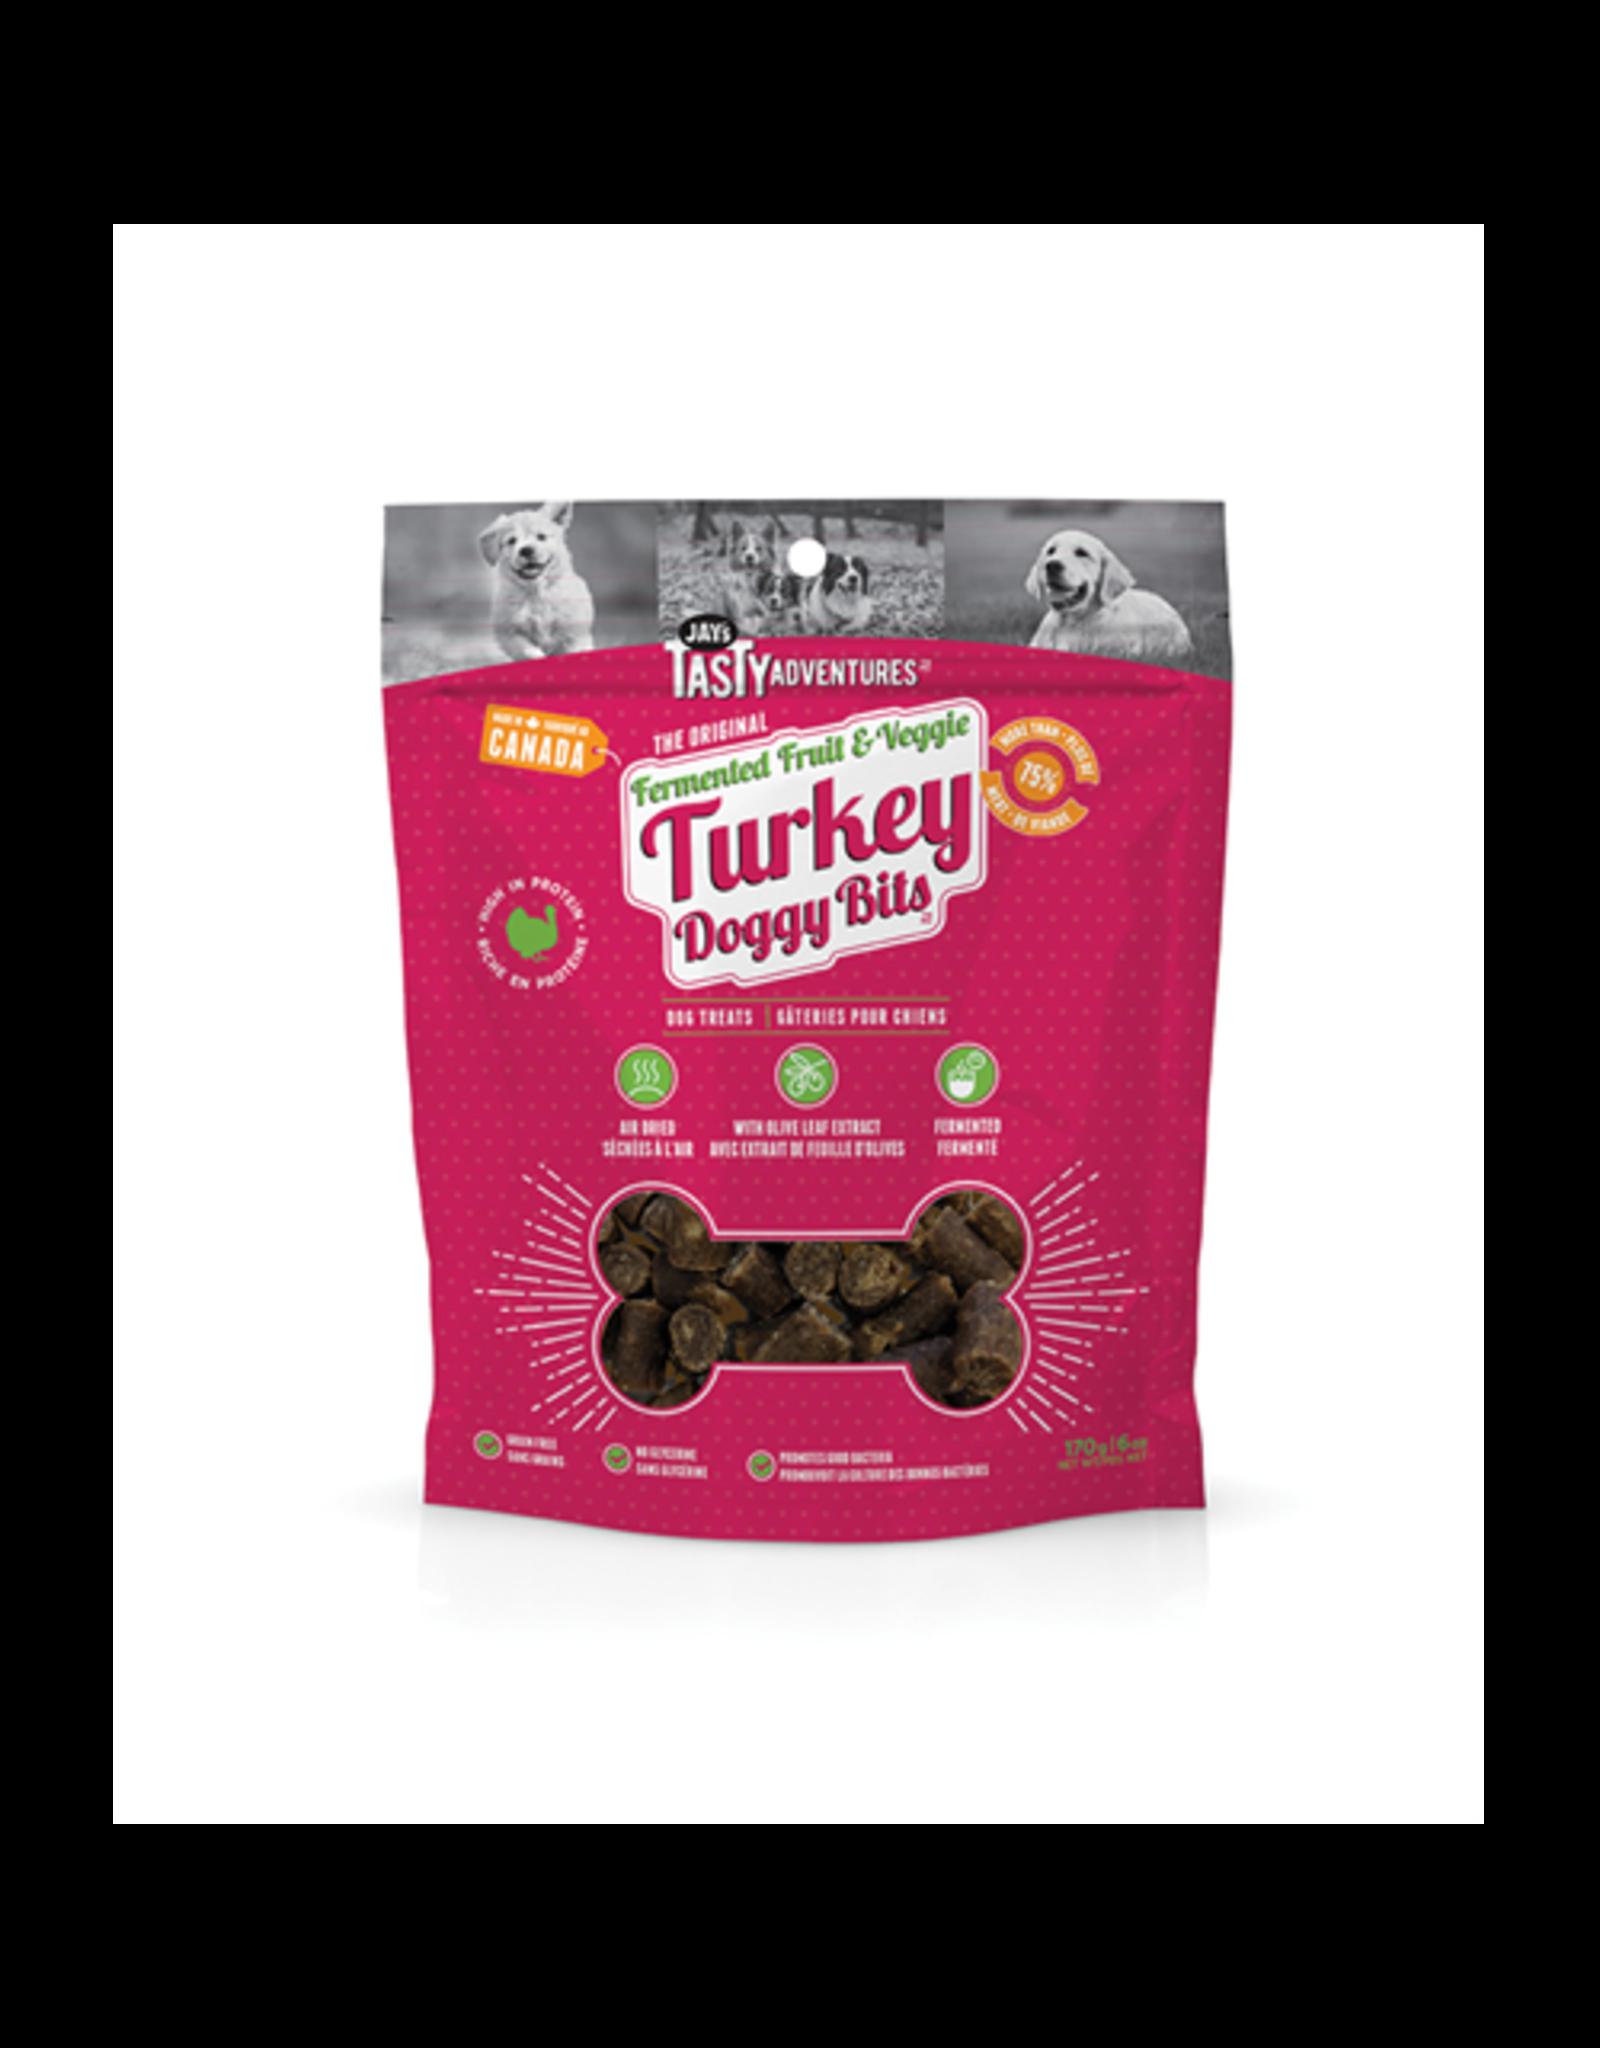 Jay's Tasty Adventures Jays Fermented Fruit & Veggie Turkey Dog Treats 170g